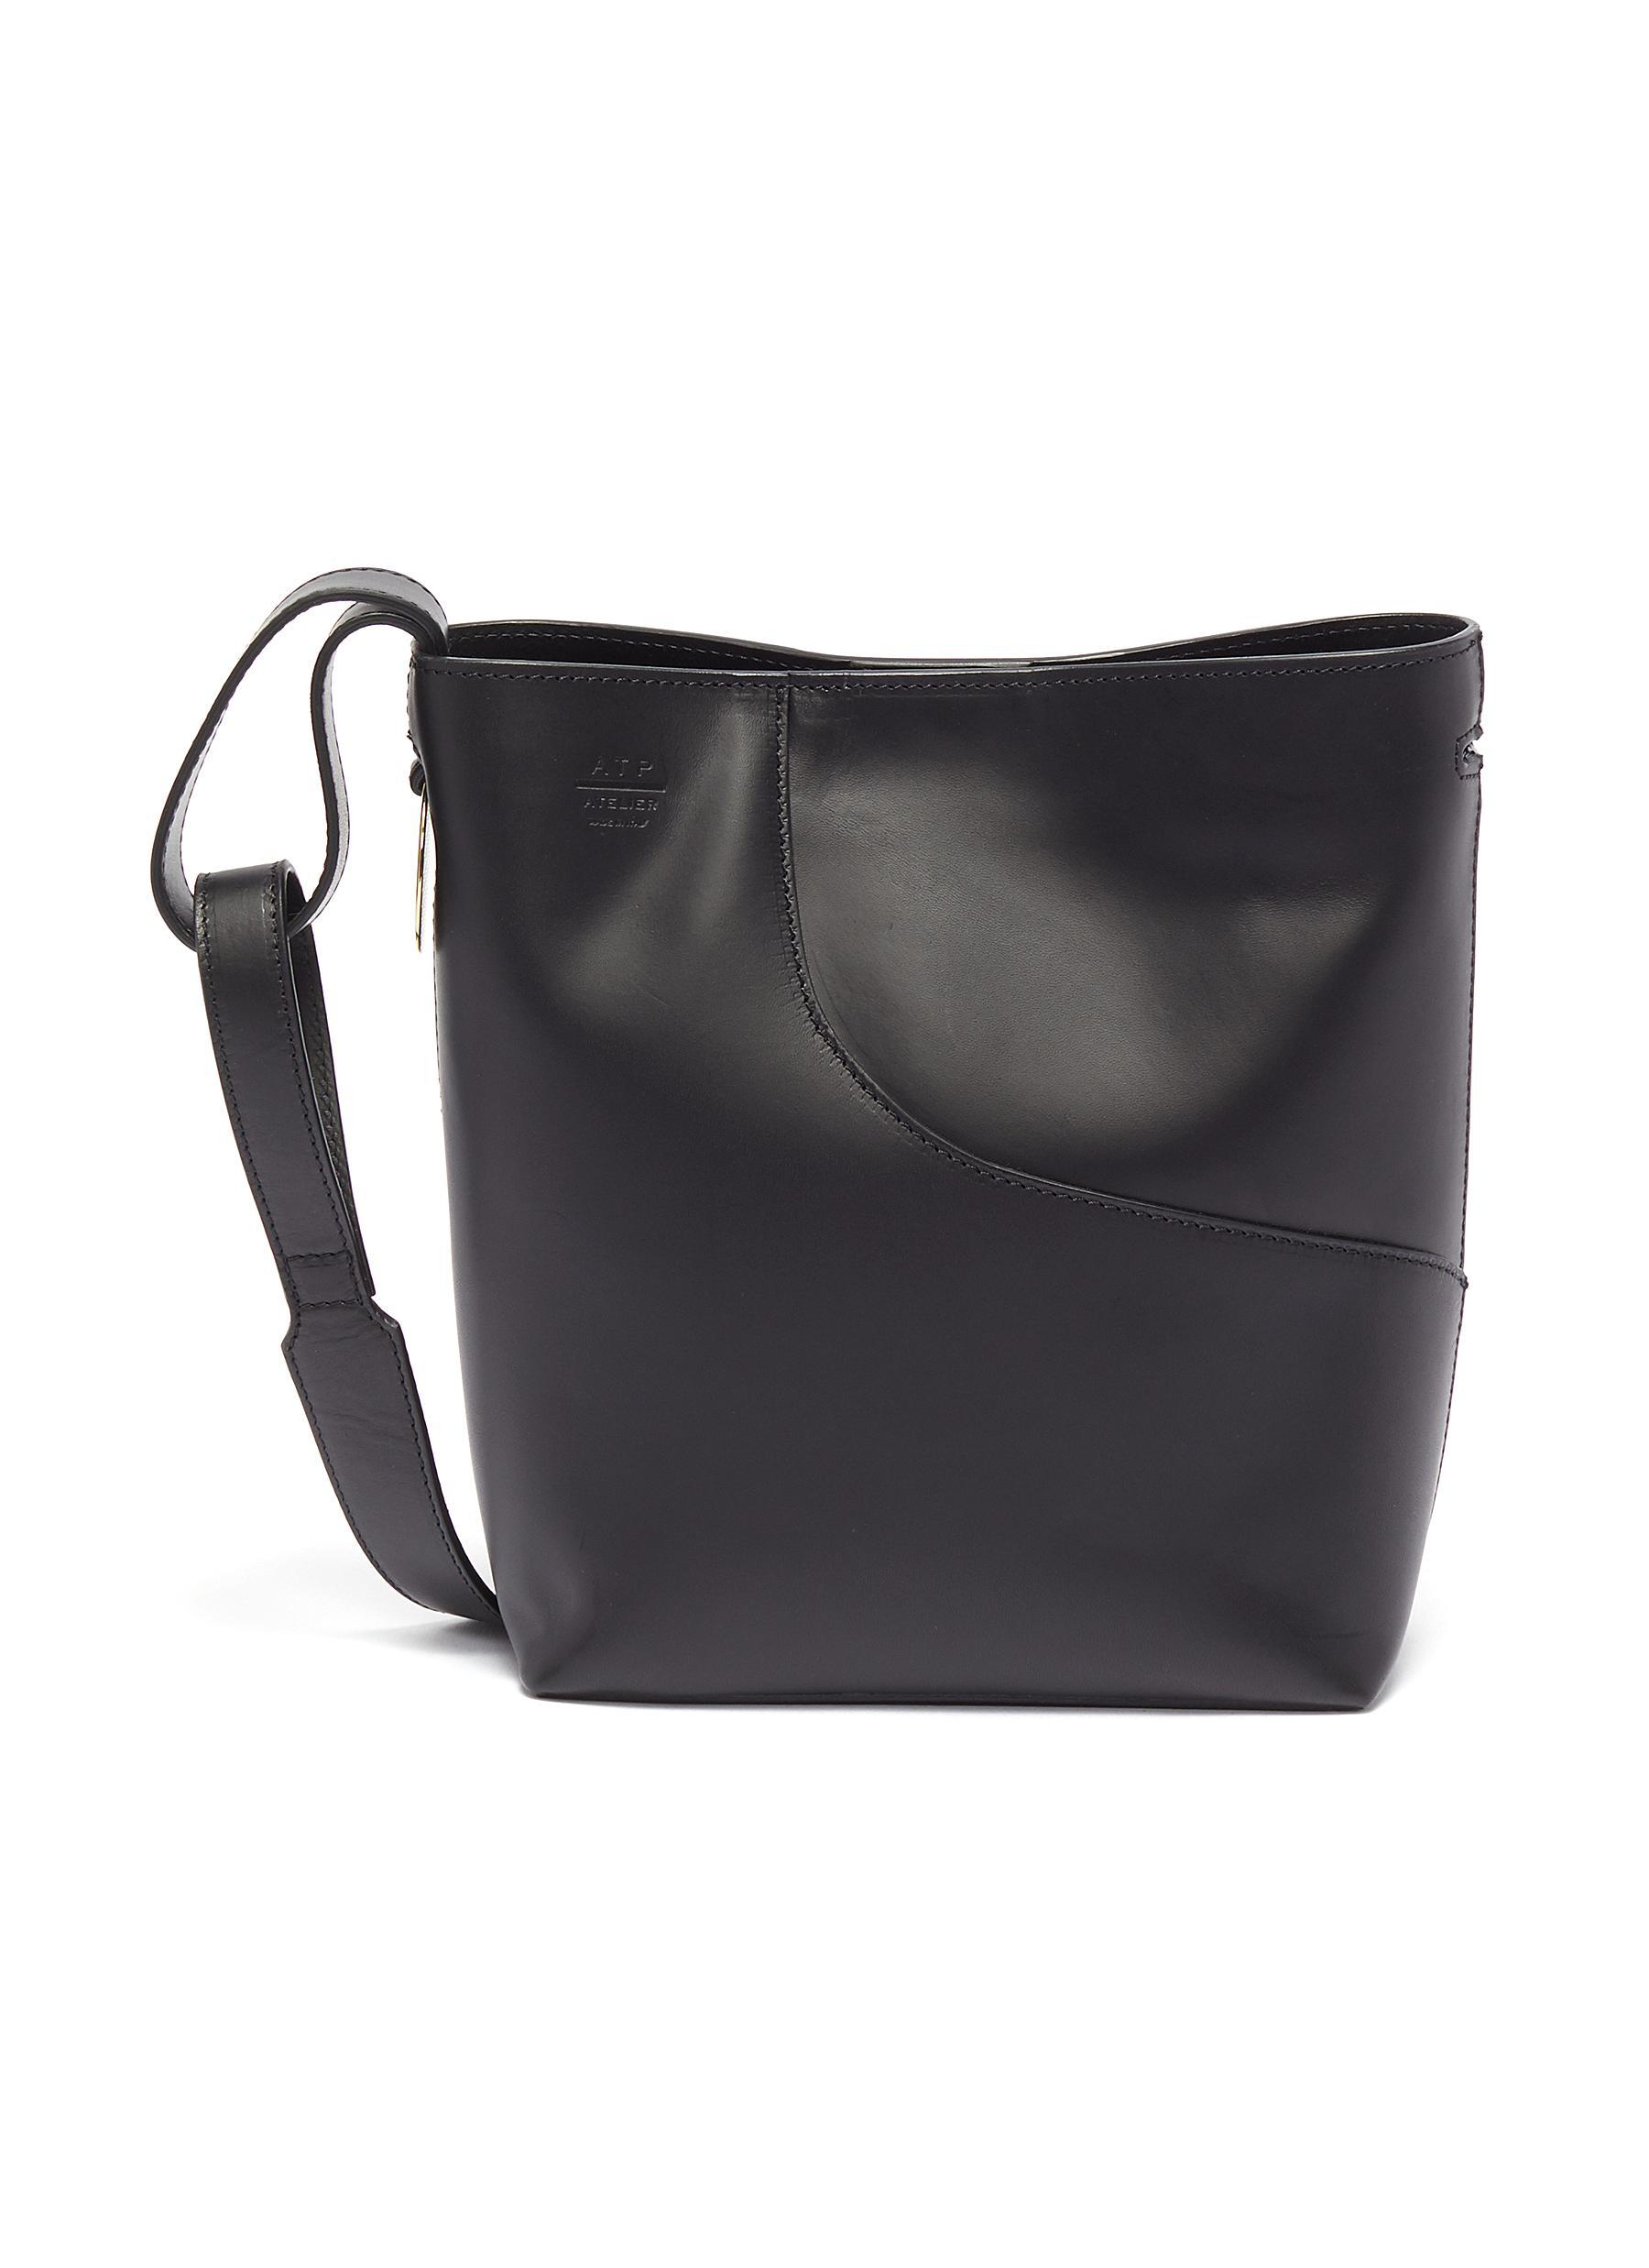 Atp Atelier 'Piombino' Leather Tote